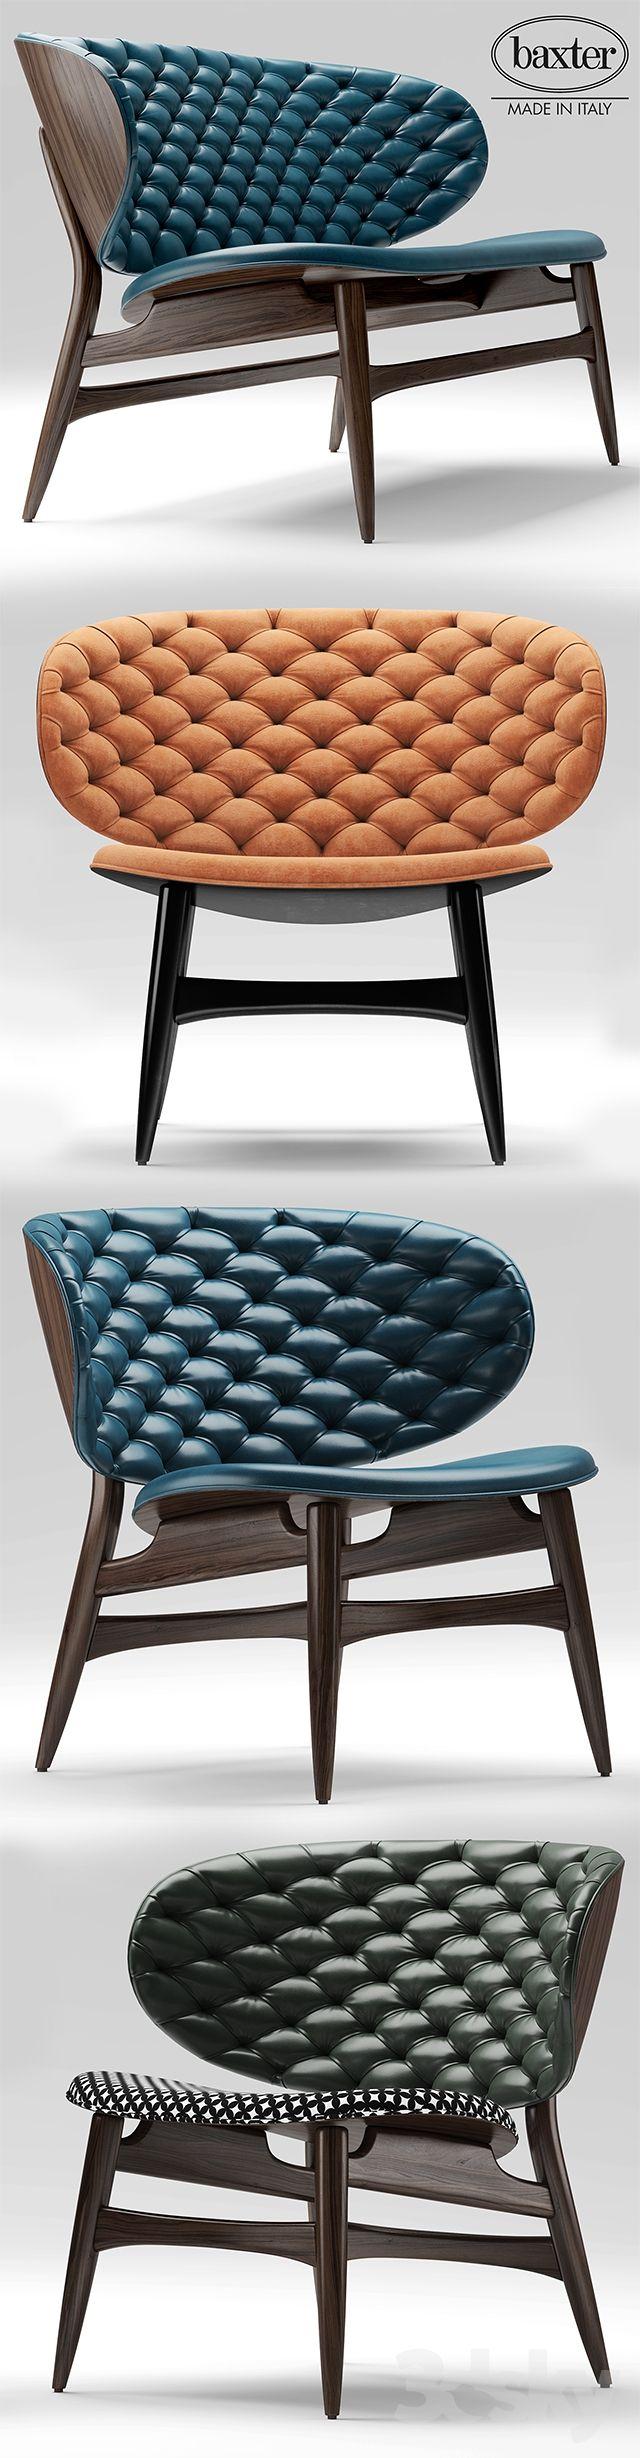 3d models: Sofa - Sofa and chair baxter DALMA